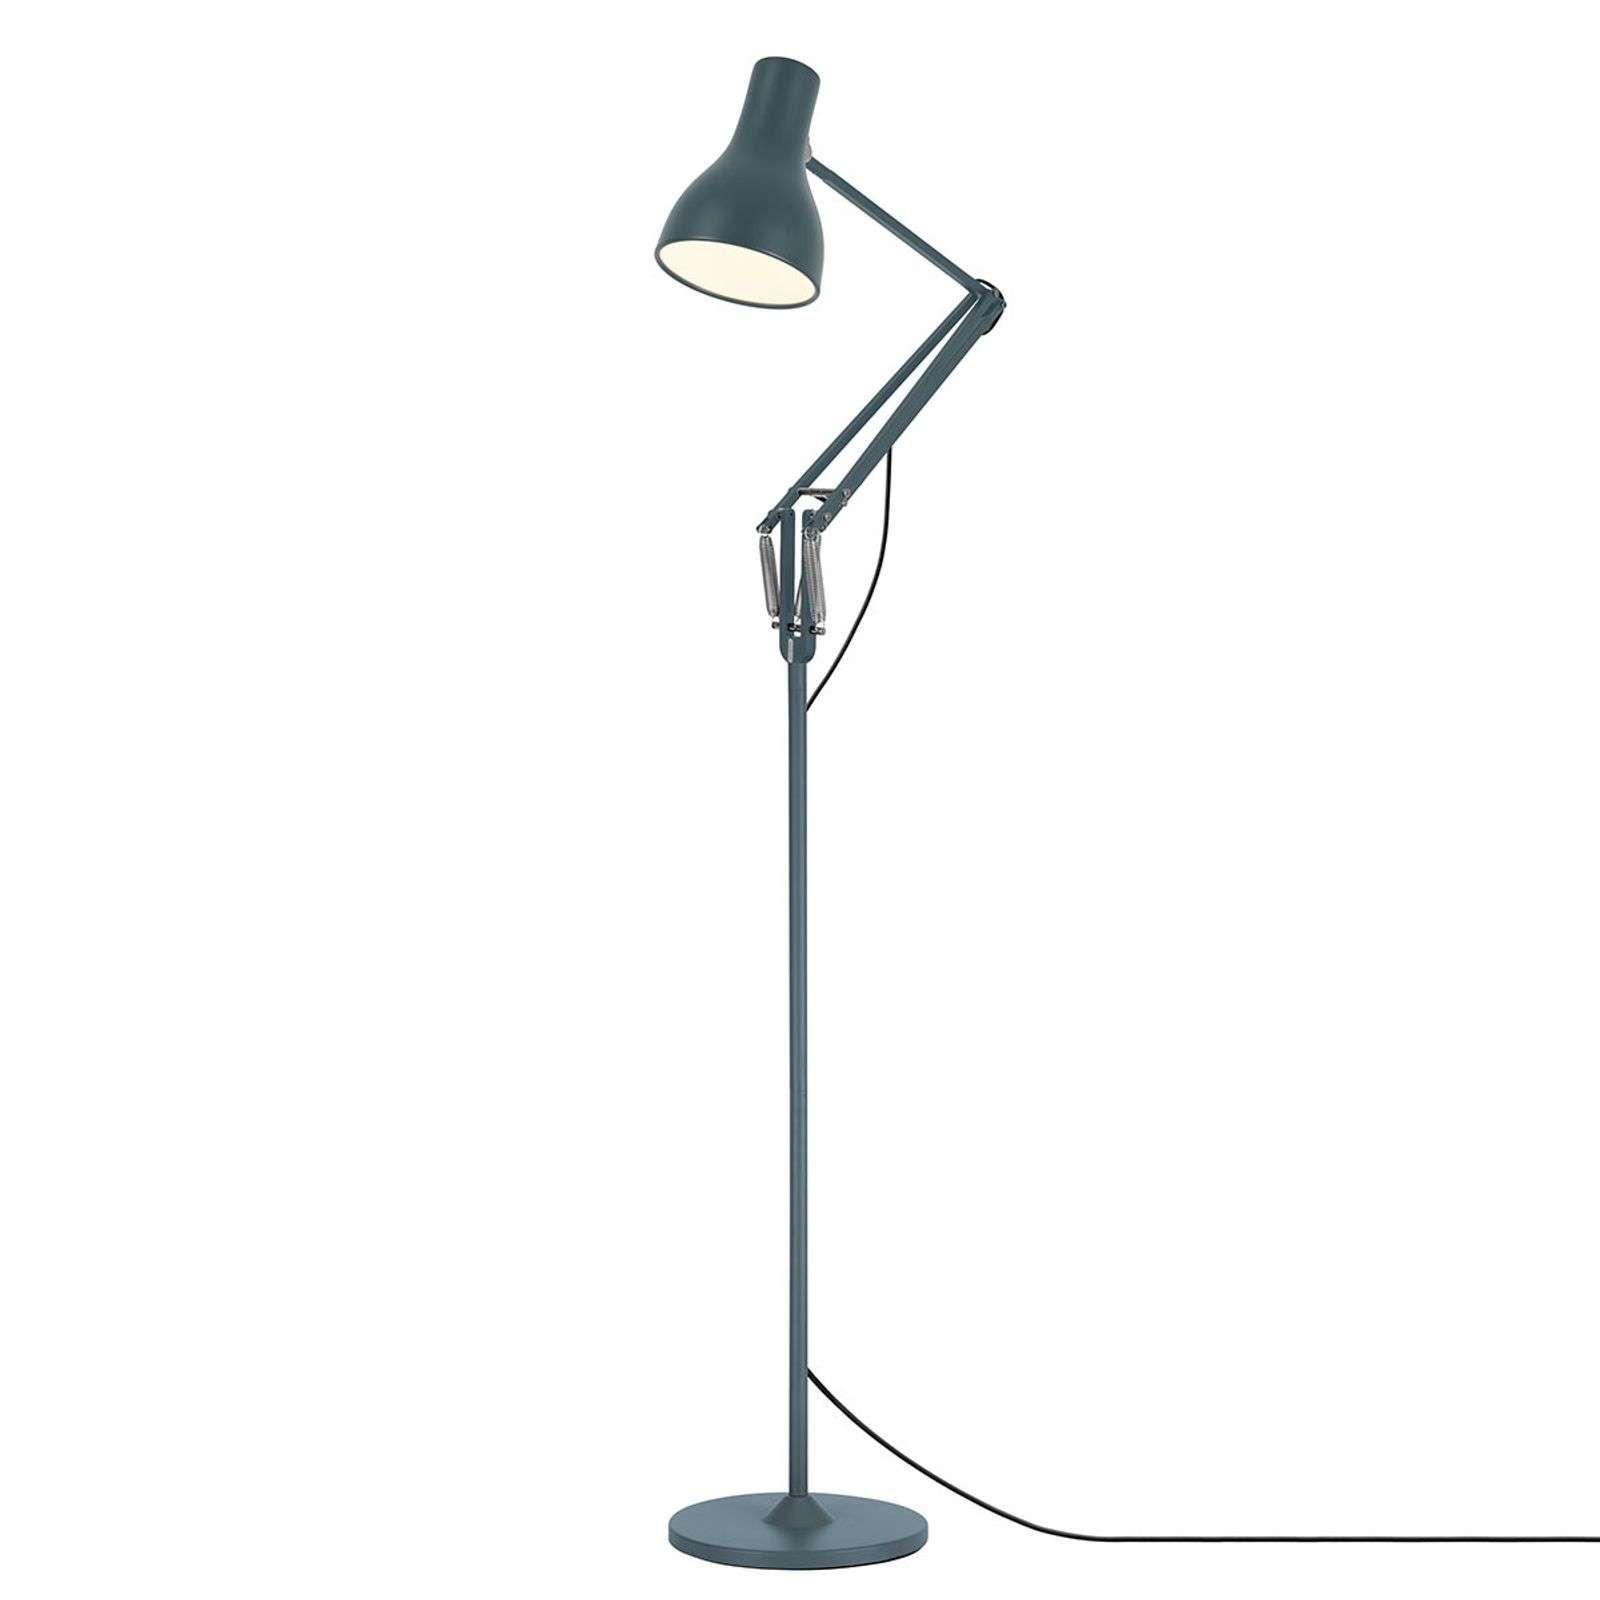 Lampadaire Exterieur Blanc | Lampe De Jardin Solaire ... tout Lampadaire Jardin Leroy Merlin